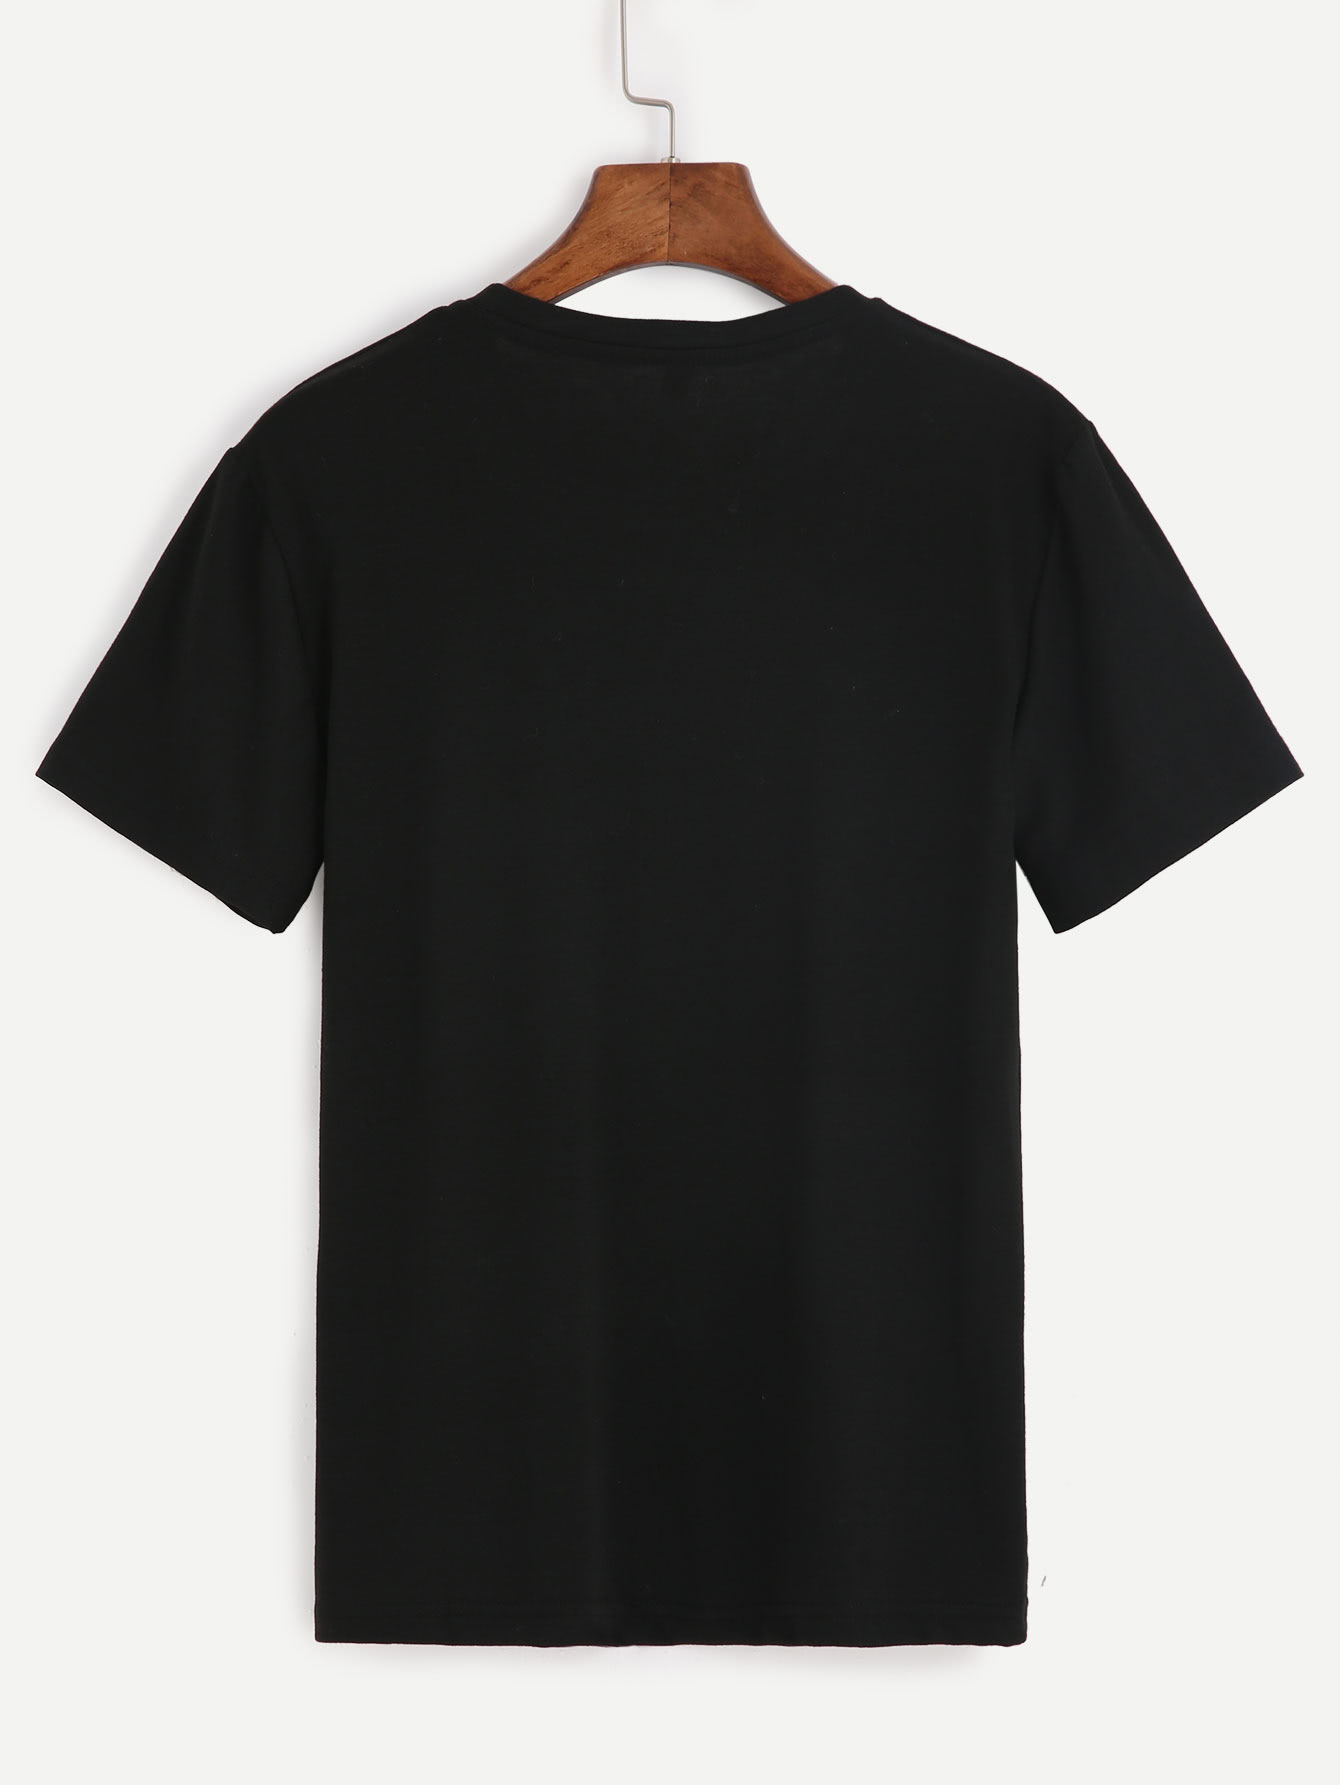 2973f7ff462e Slogan Print T-shirt | SHEIN UK